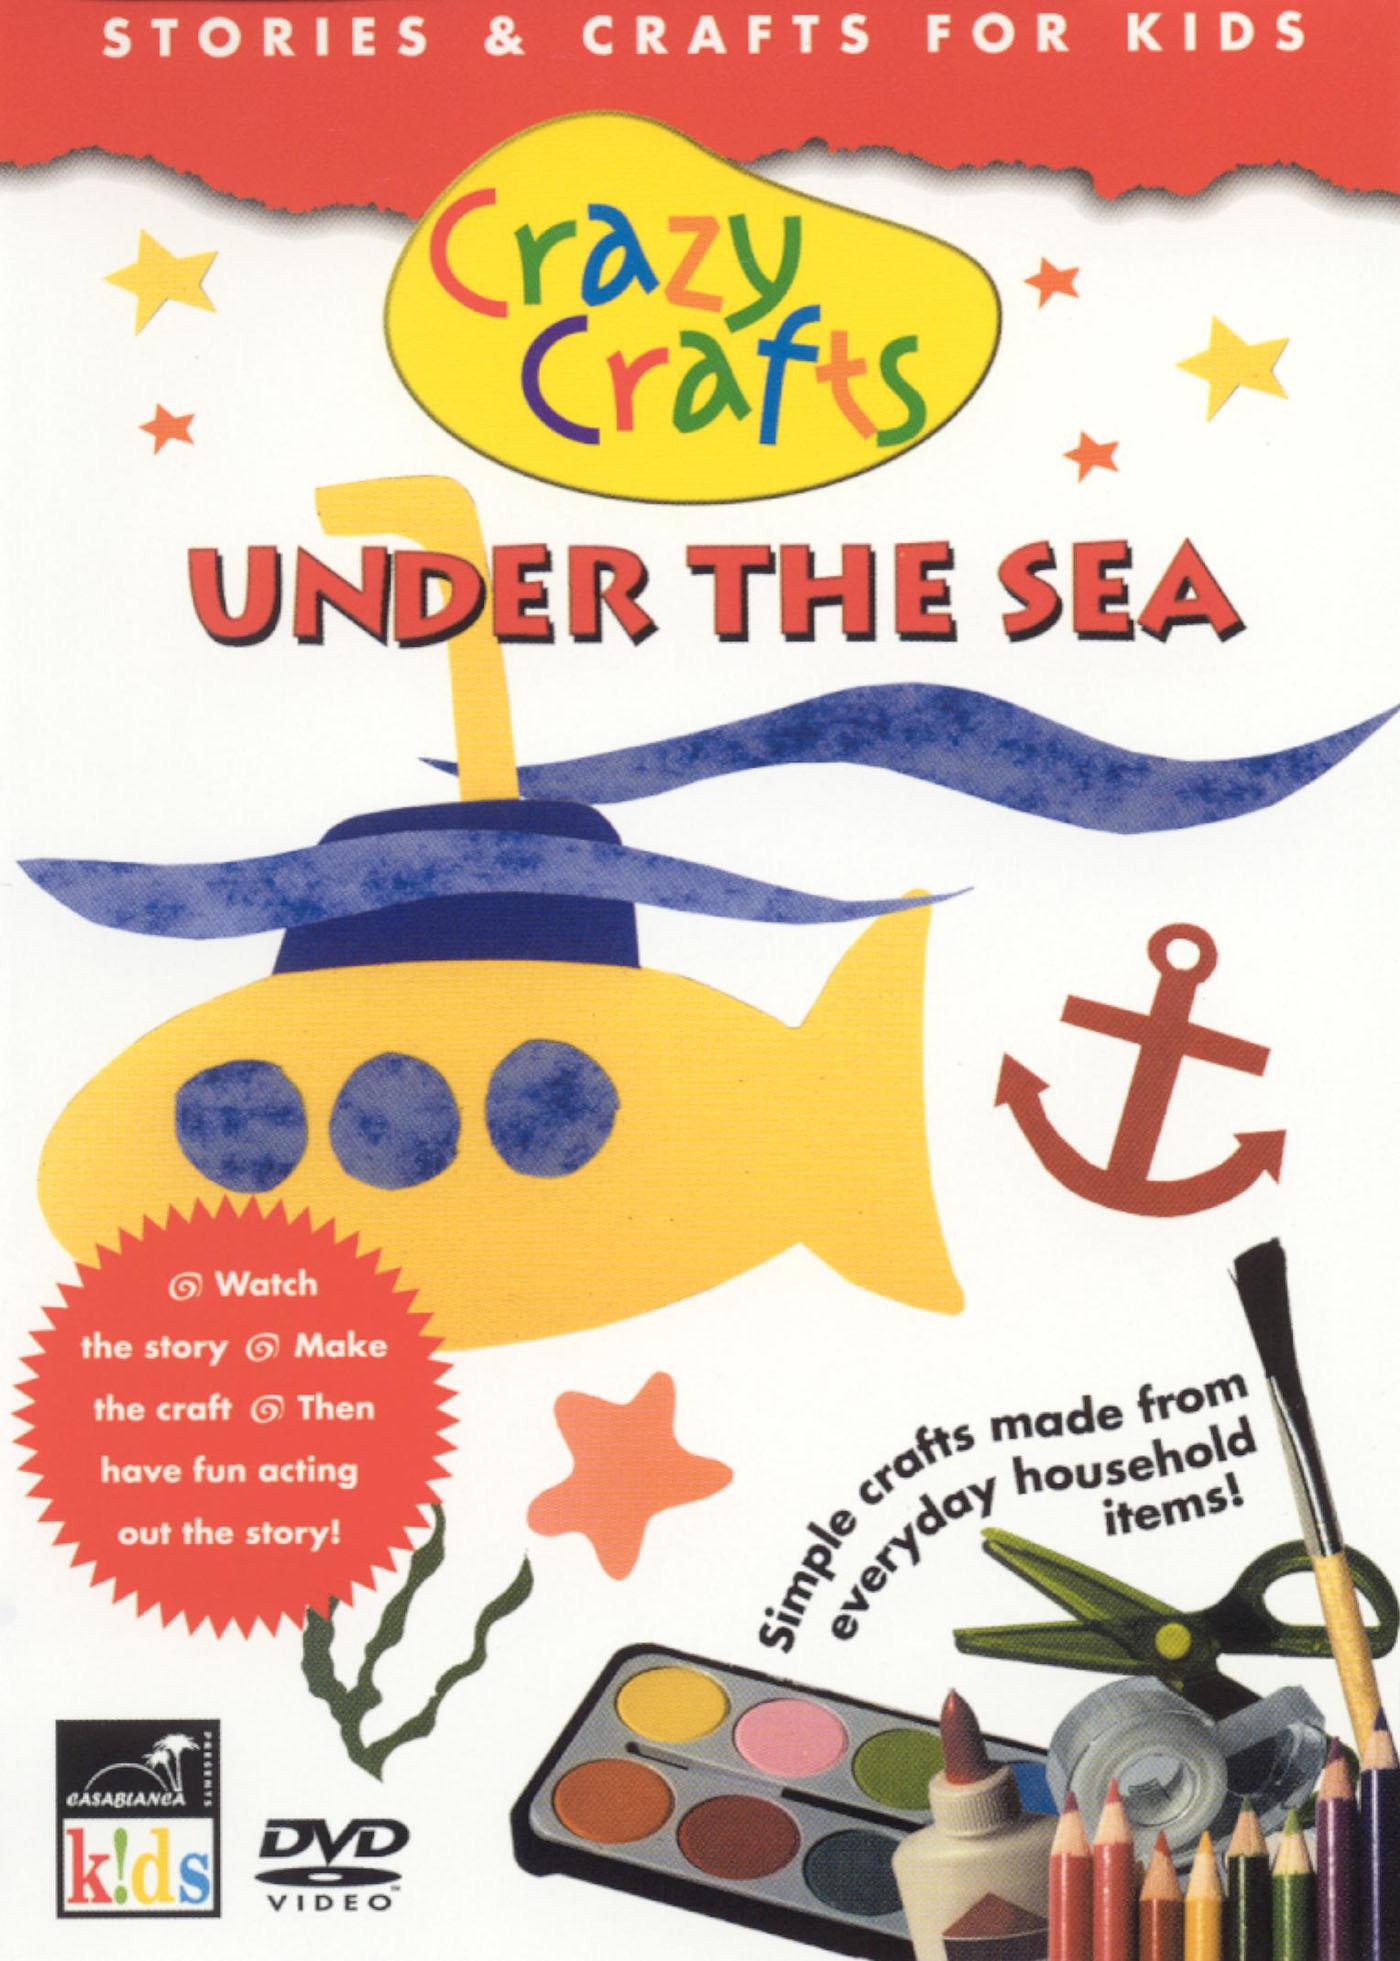 Crazy Crafts: Under the Sea